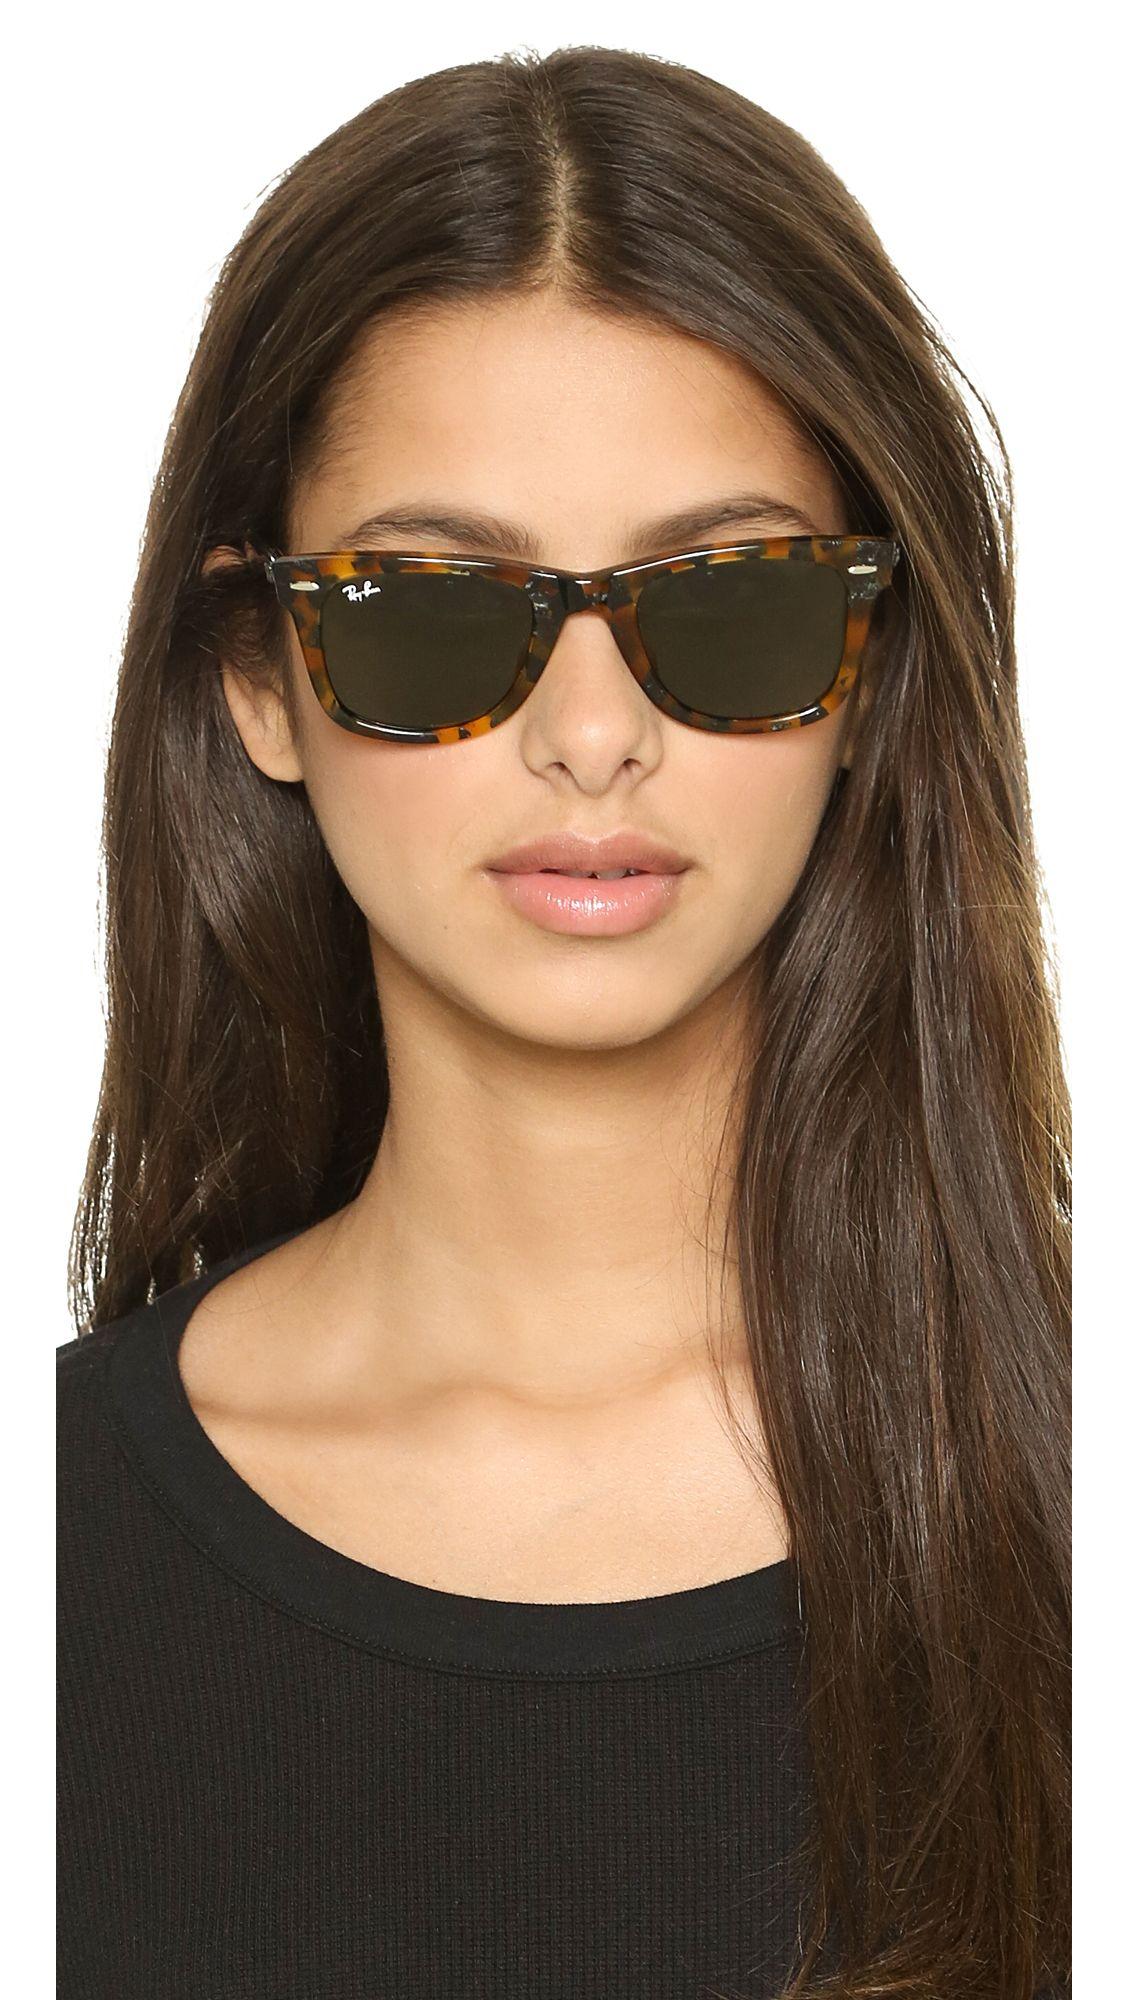 aa92623ee Icons Wayfarer Sunglasses | sunny vacation | Sunglasses, Ray ban ...